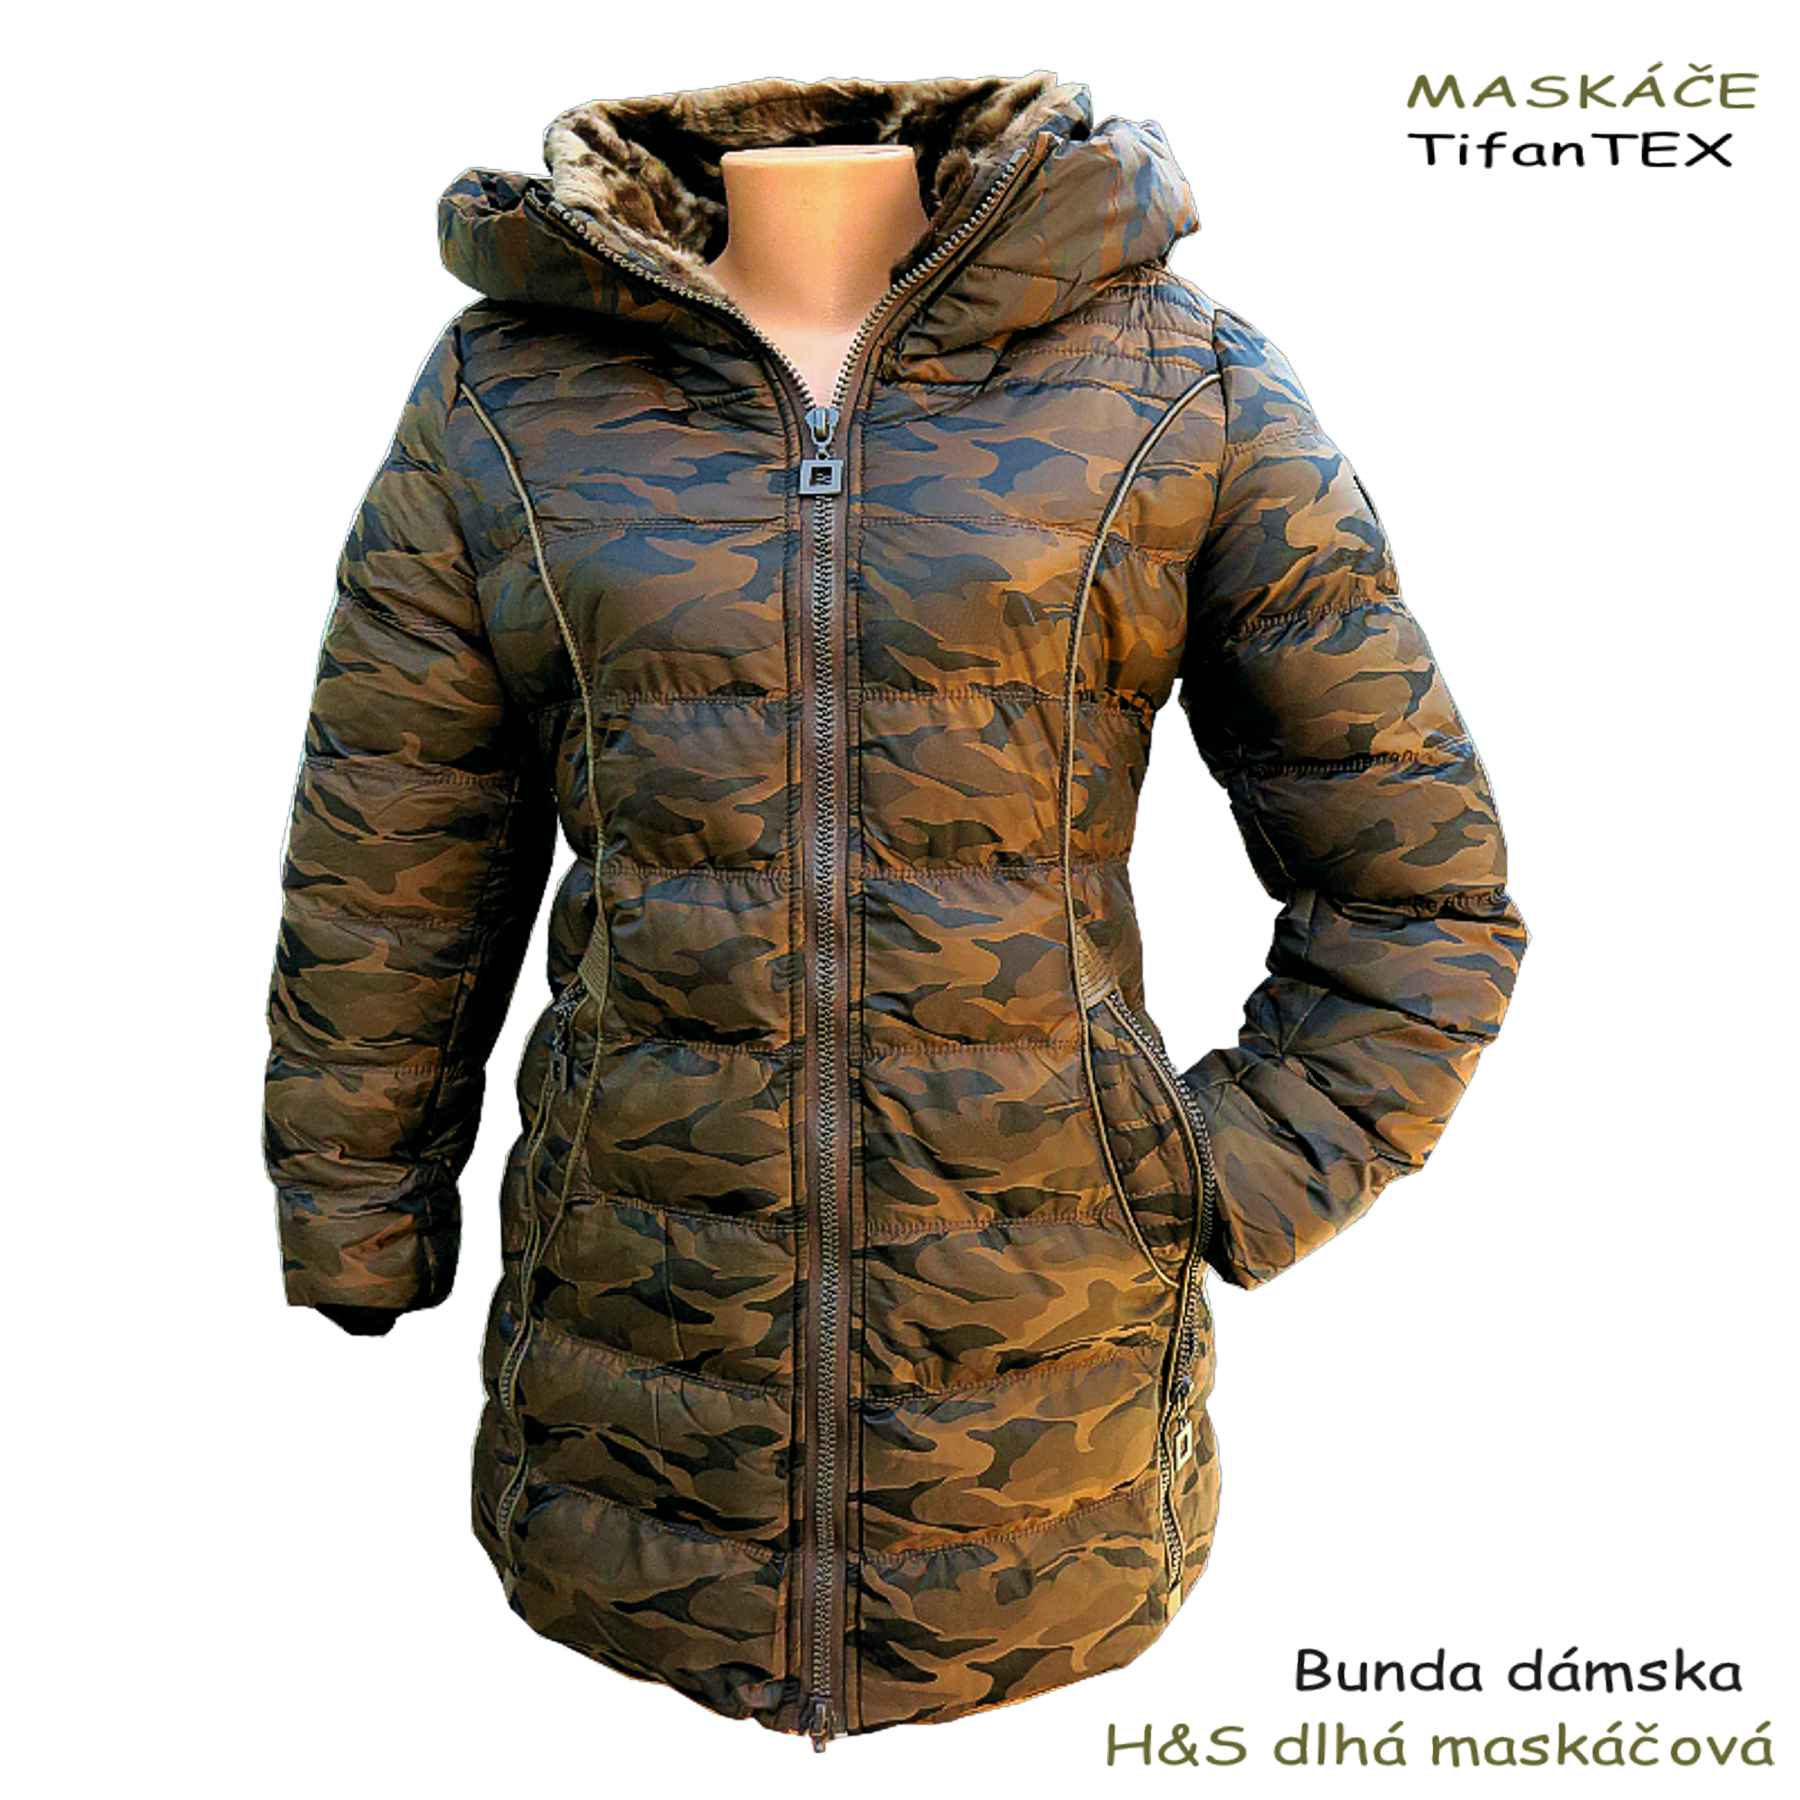 016b03dddf62 Zimná prešívaná bunda dámska H S dlhá maskáčová eshop